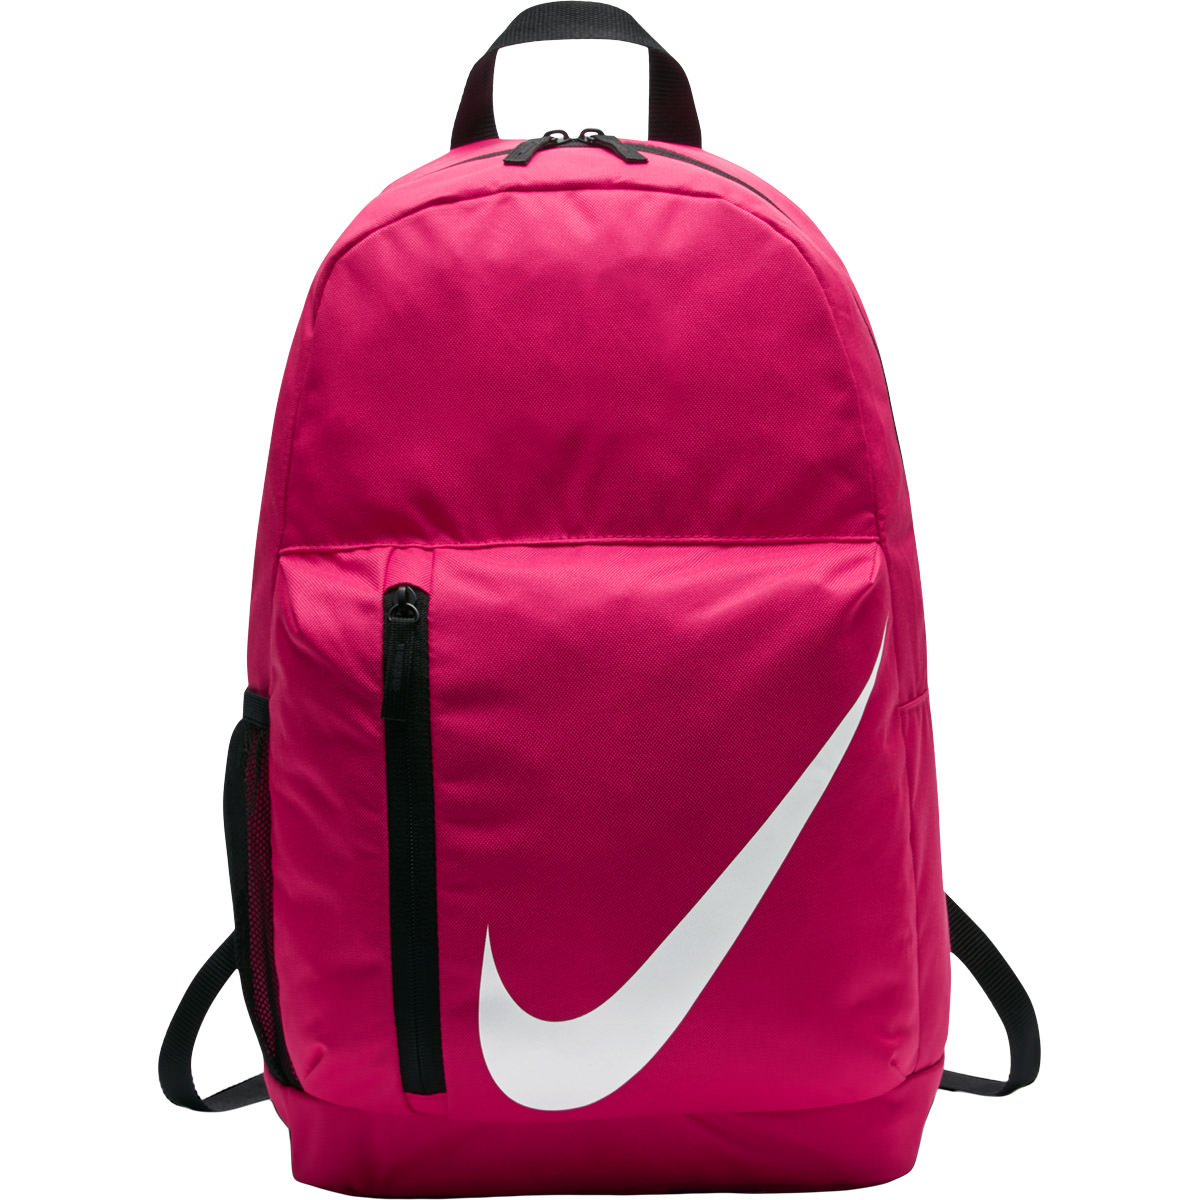 Nike Elemental Rygsæk